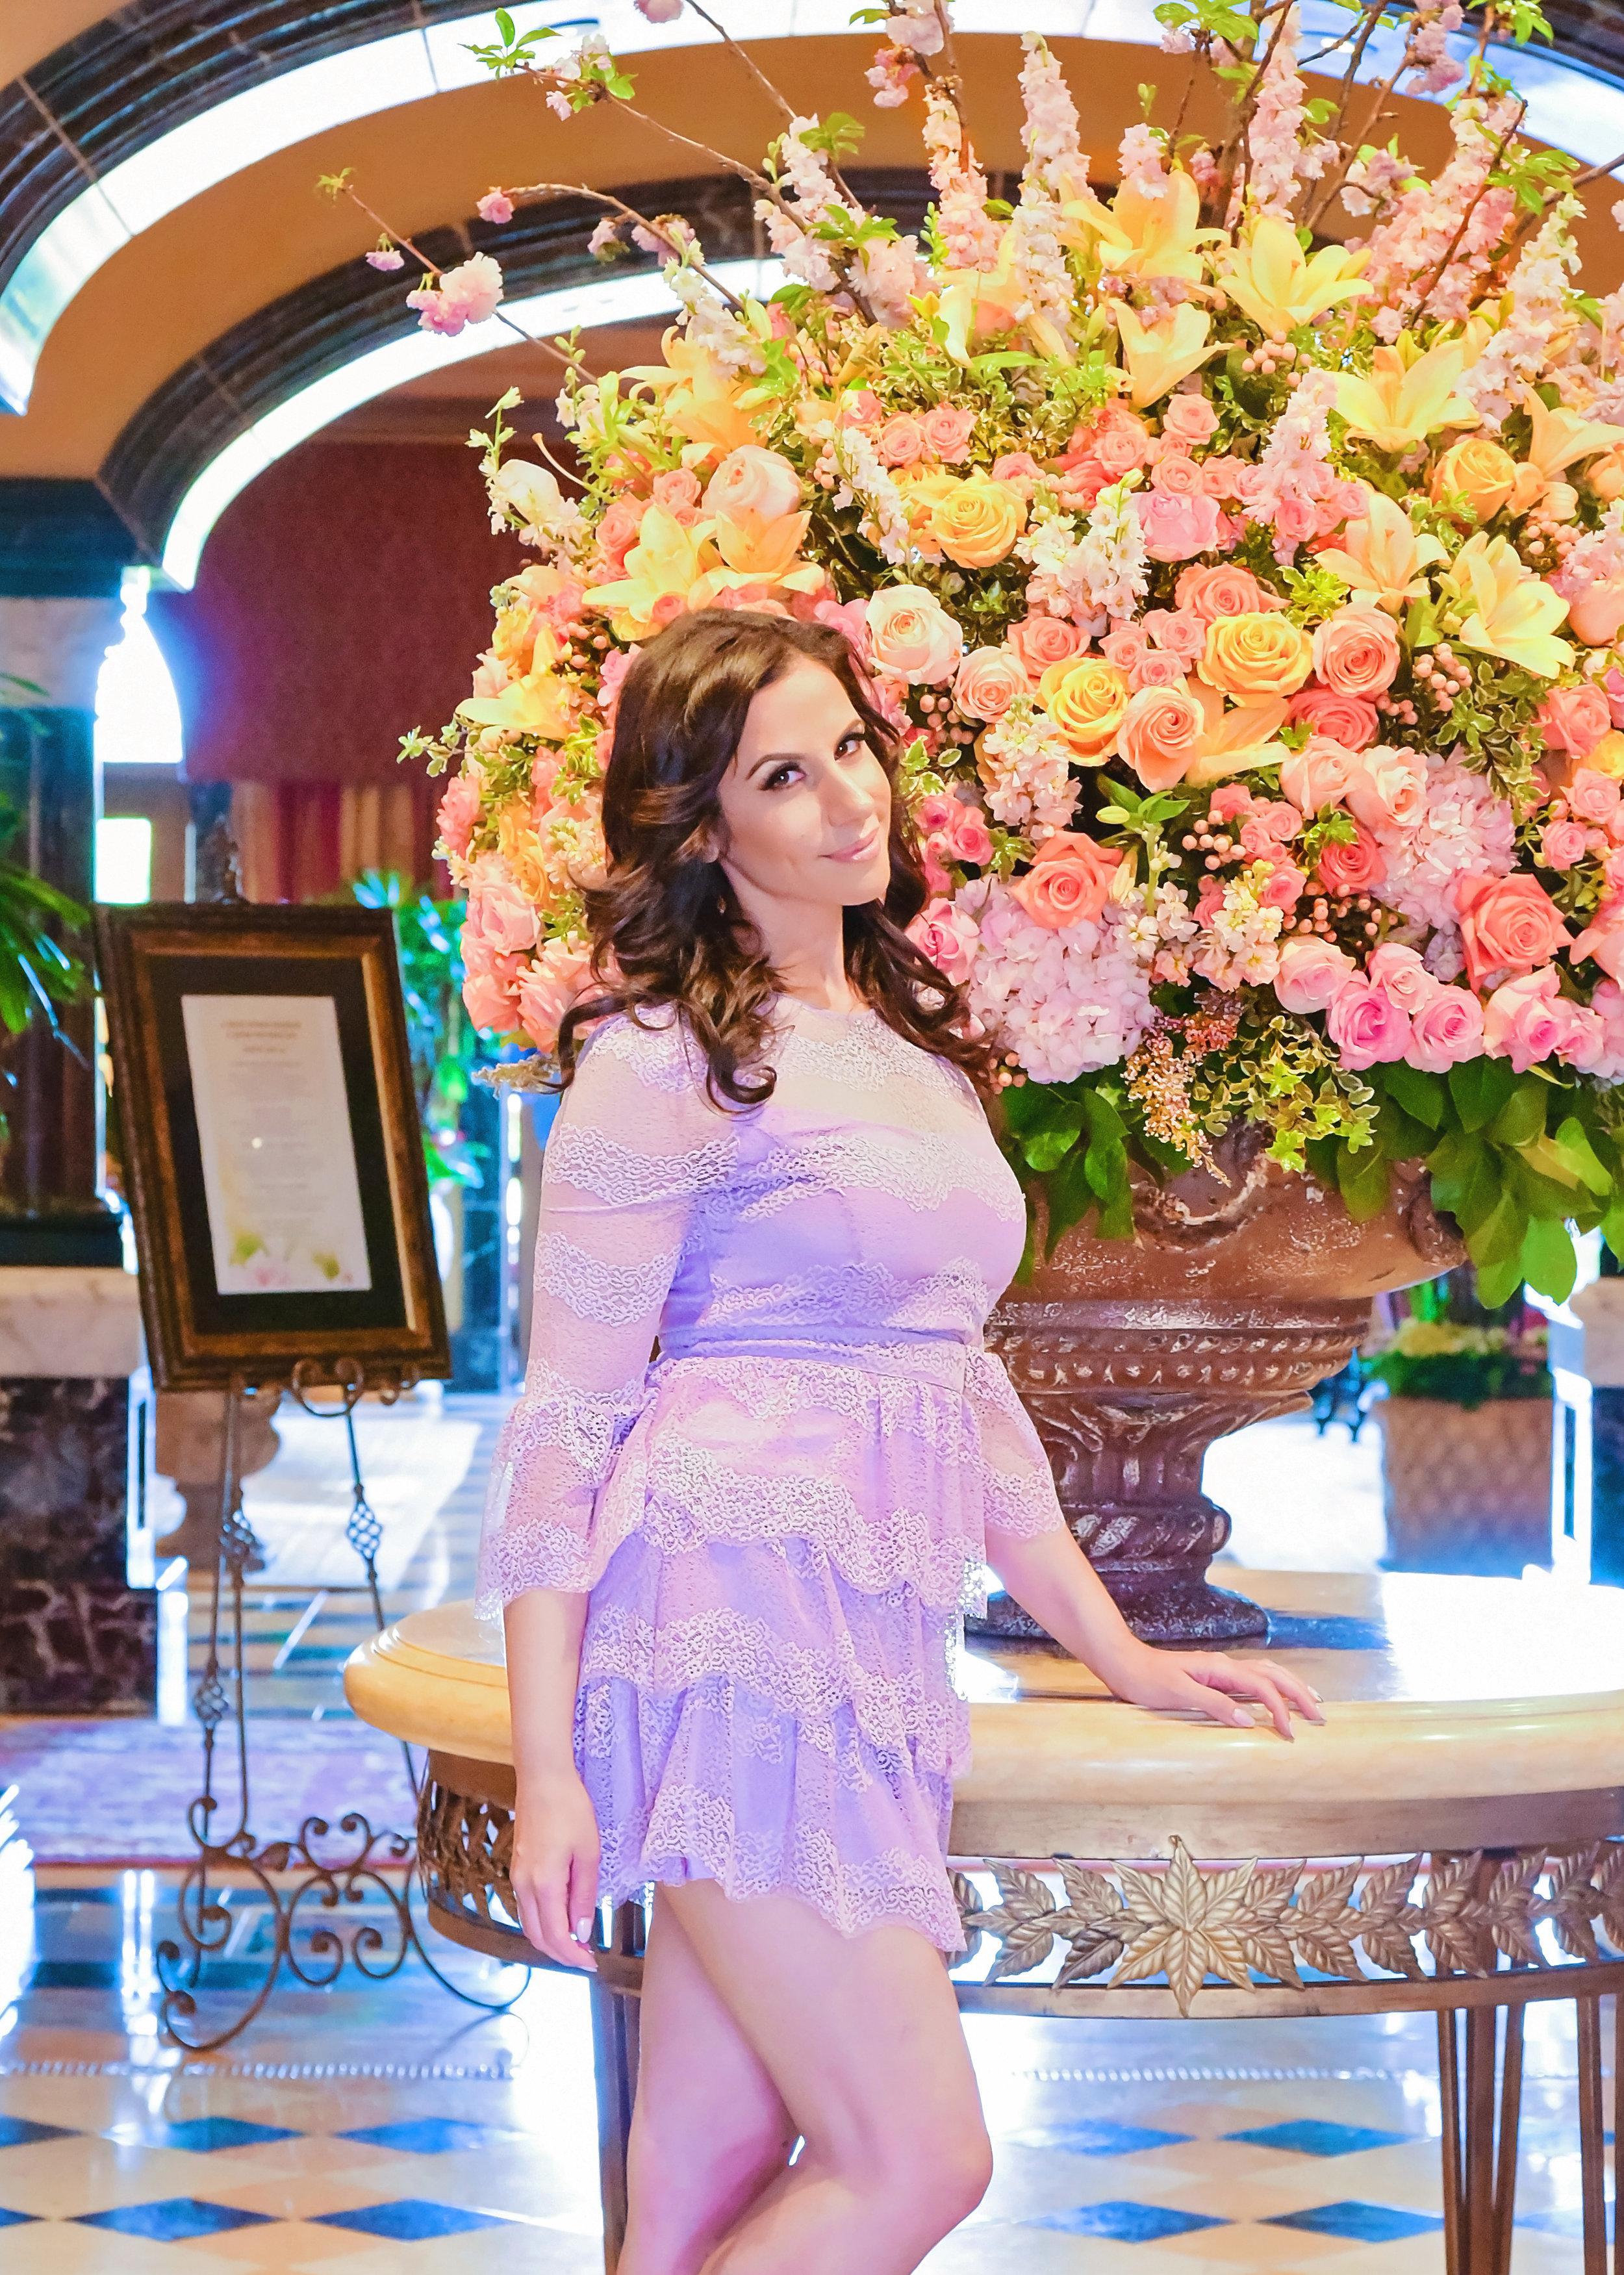 Fashion Purple Dress | Fashion Photography | Lacey O